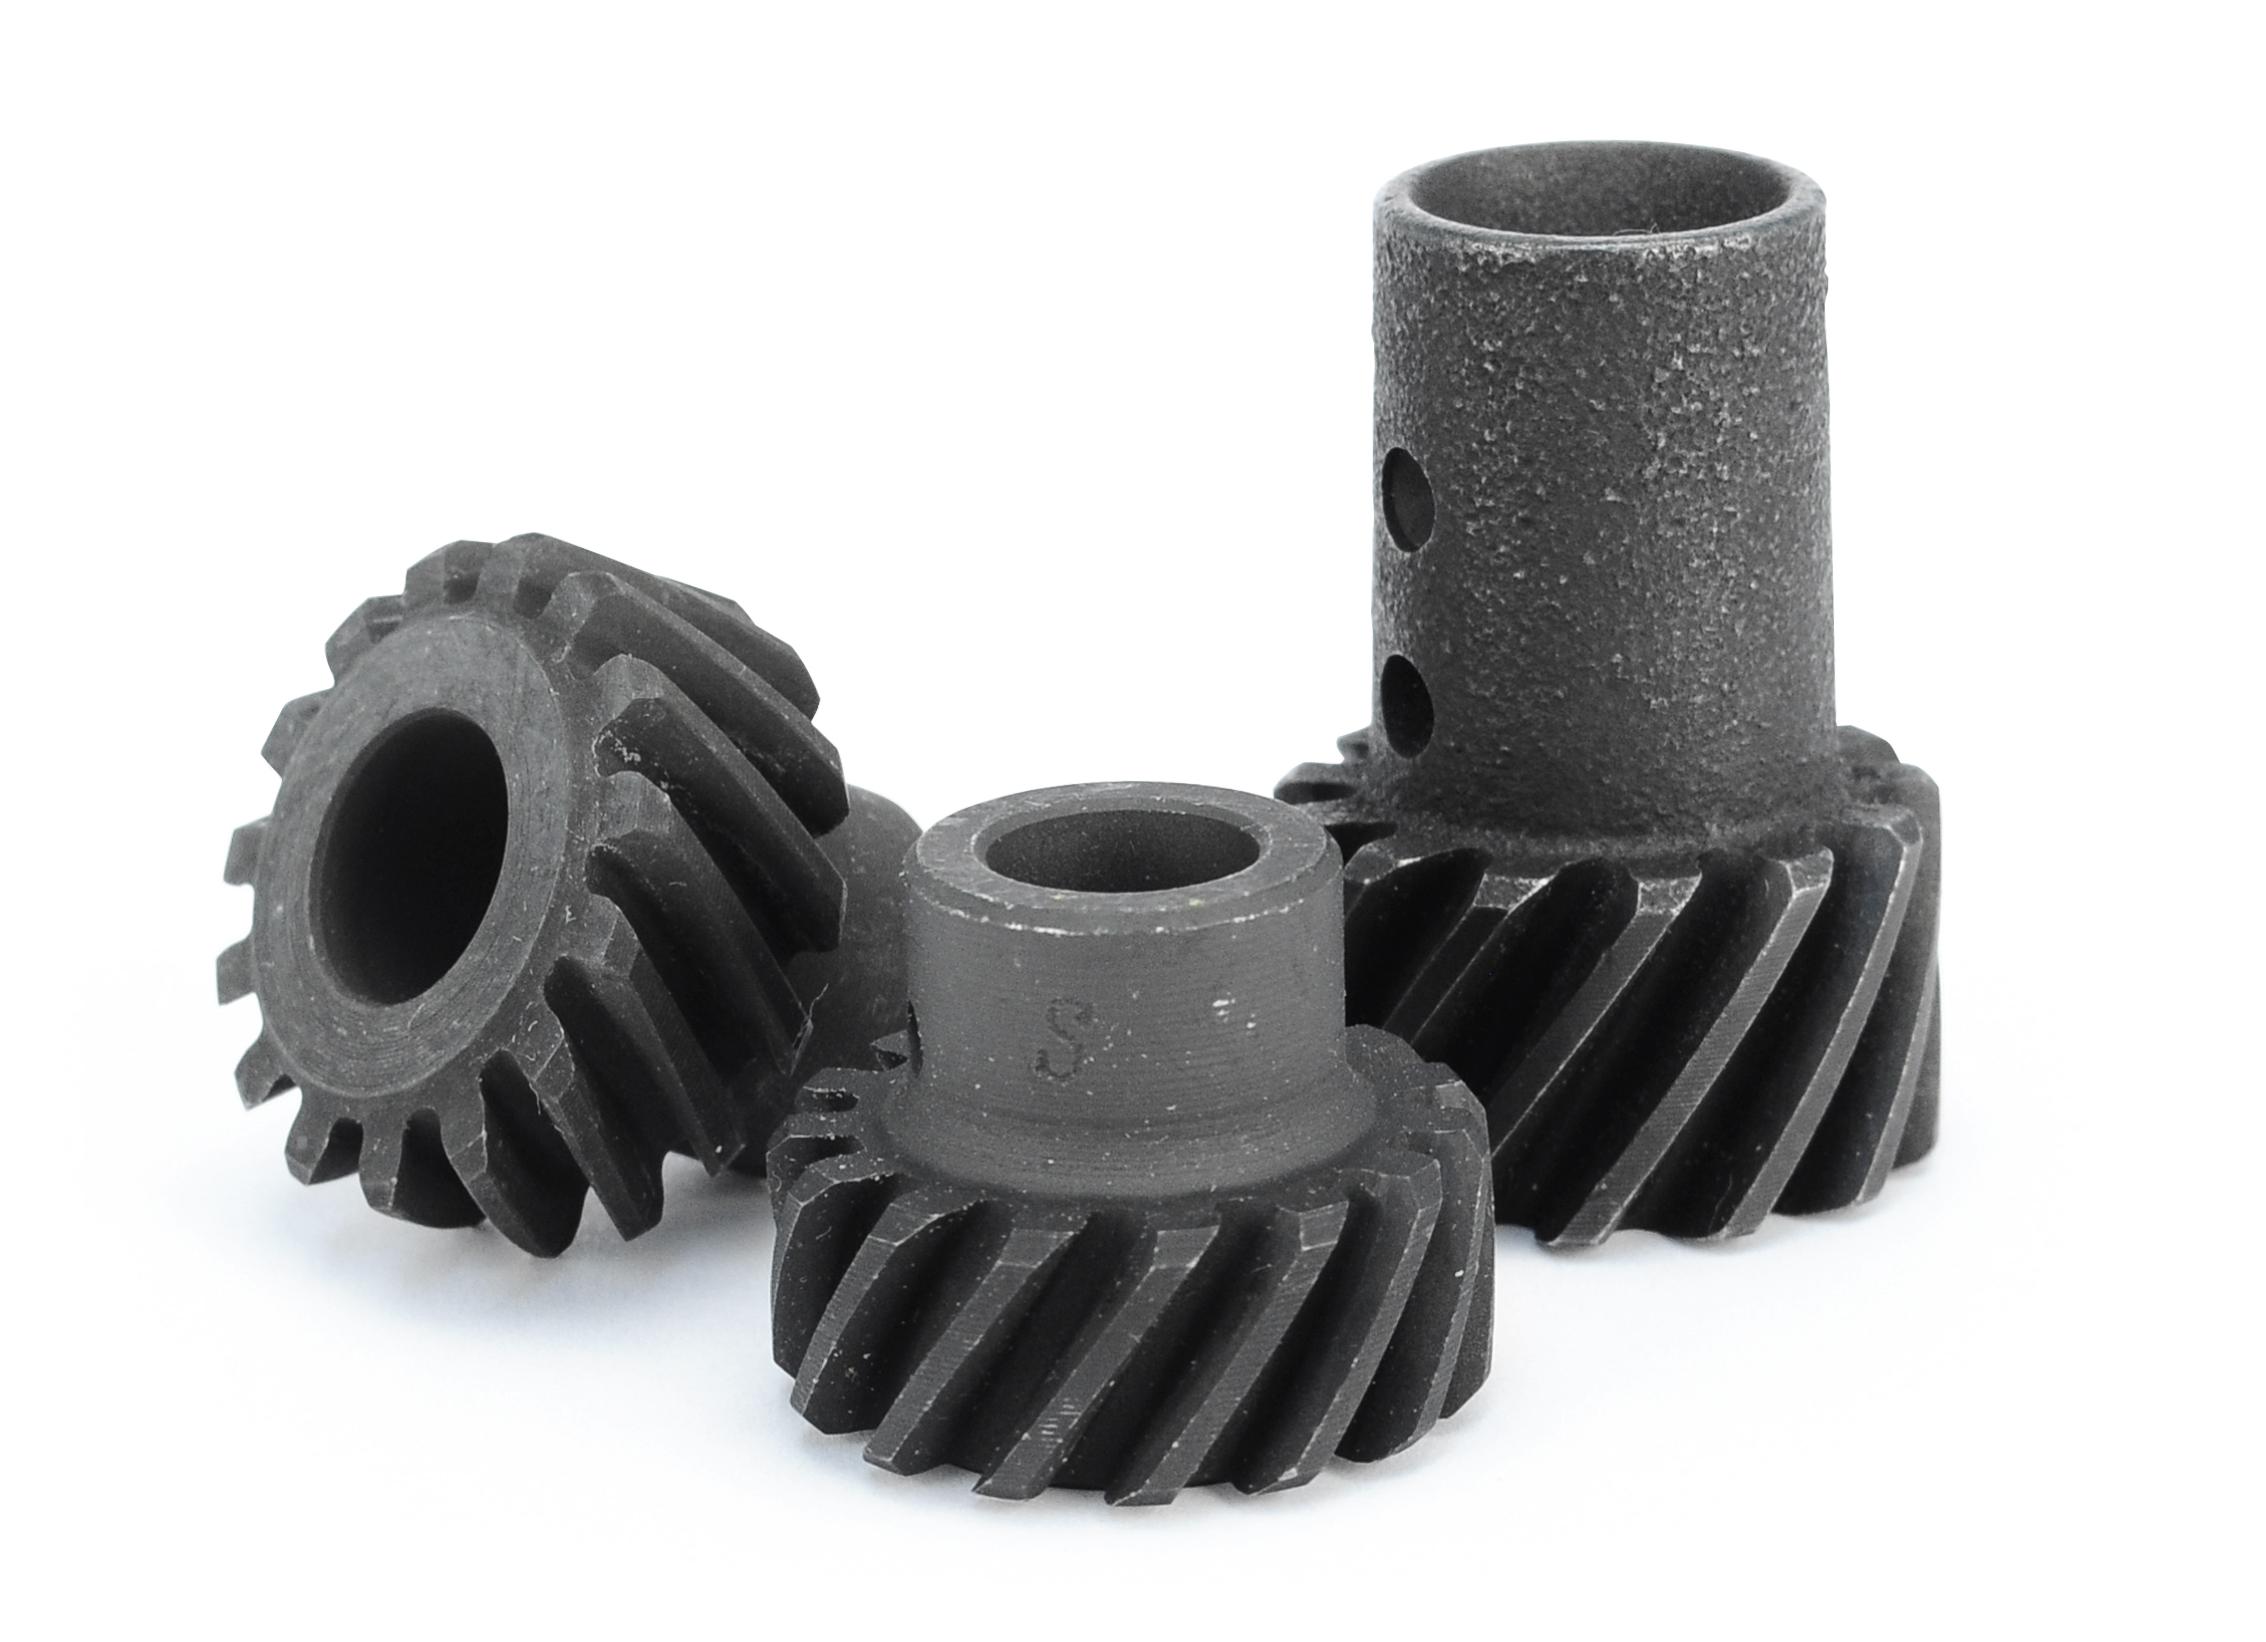 Melonized Distributor Gears